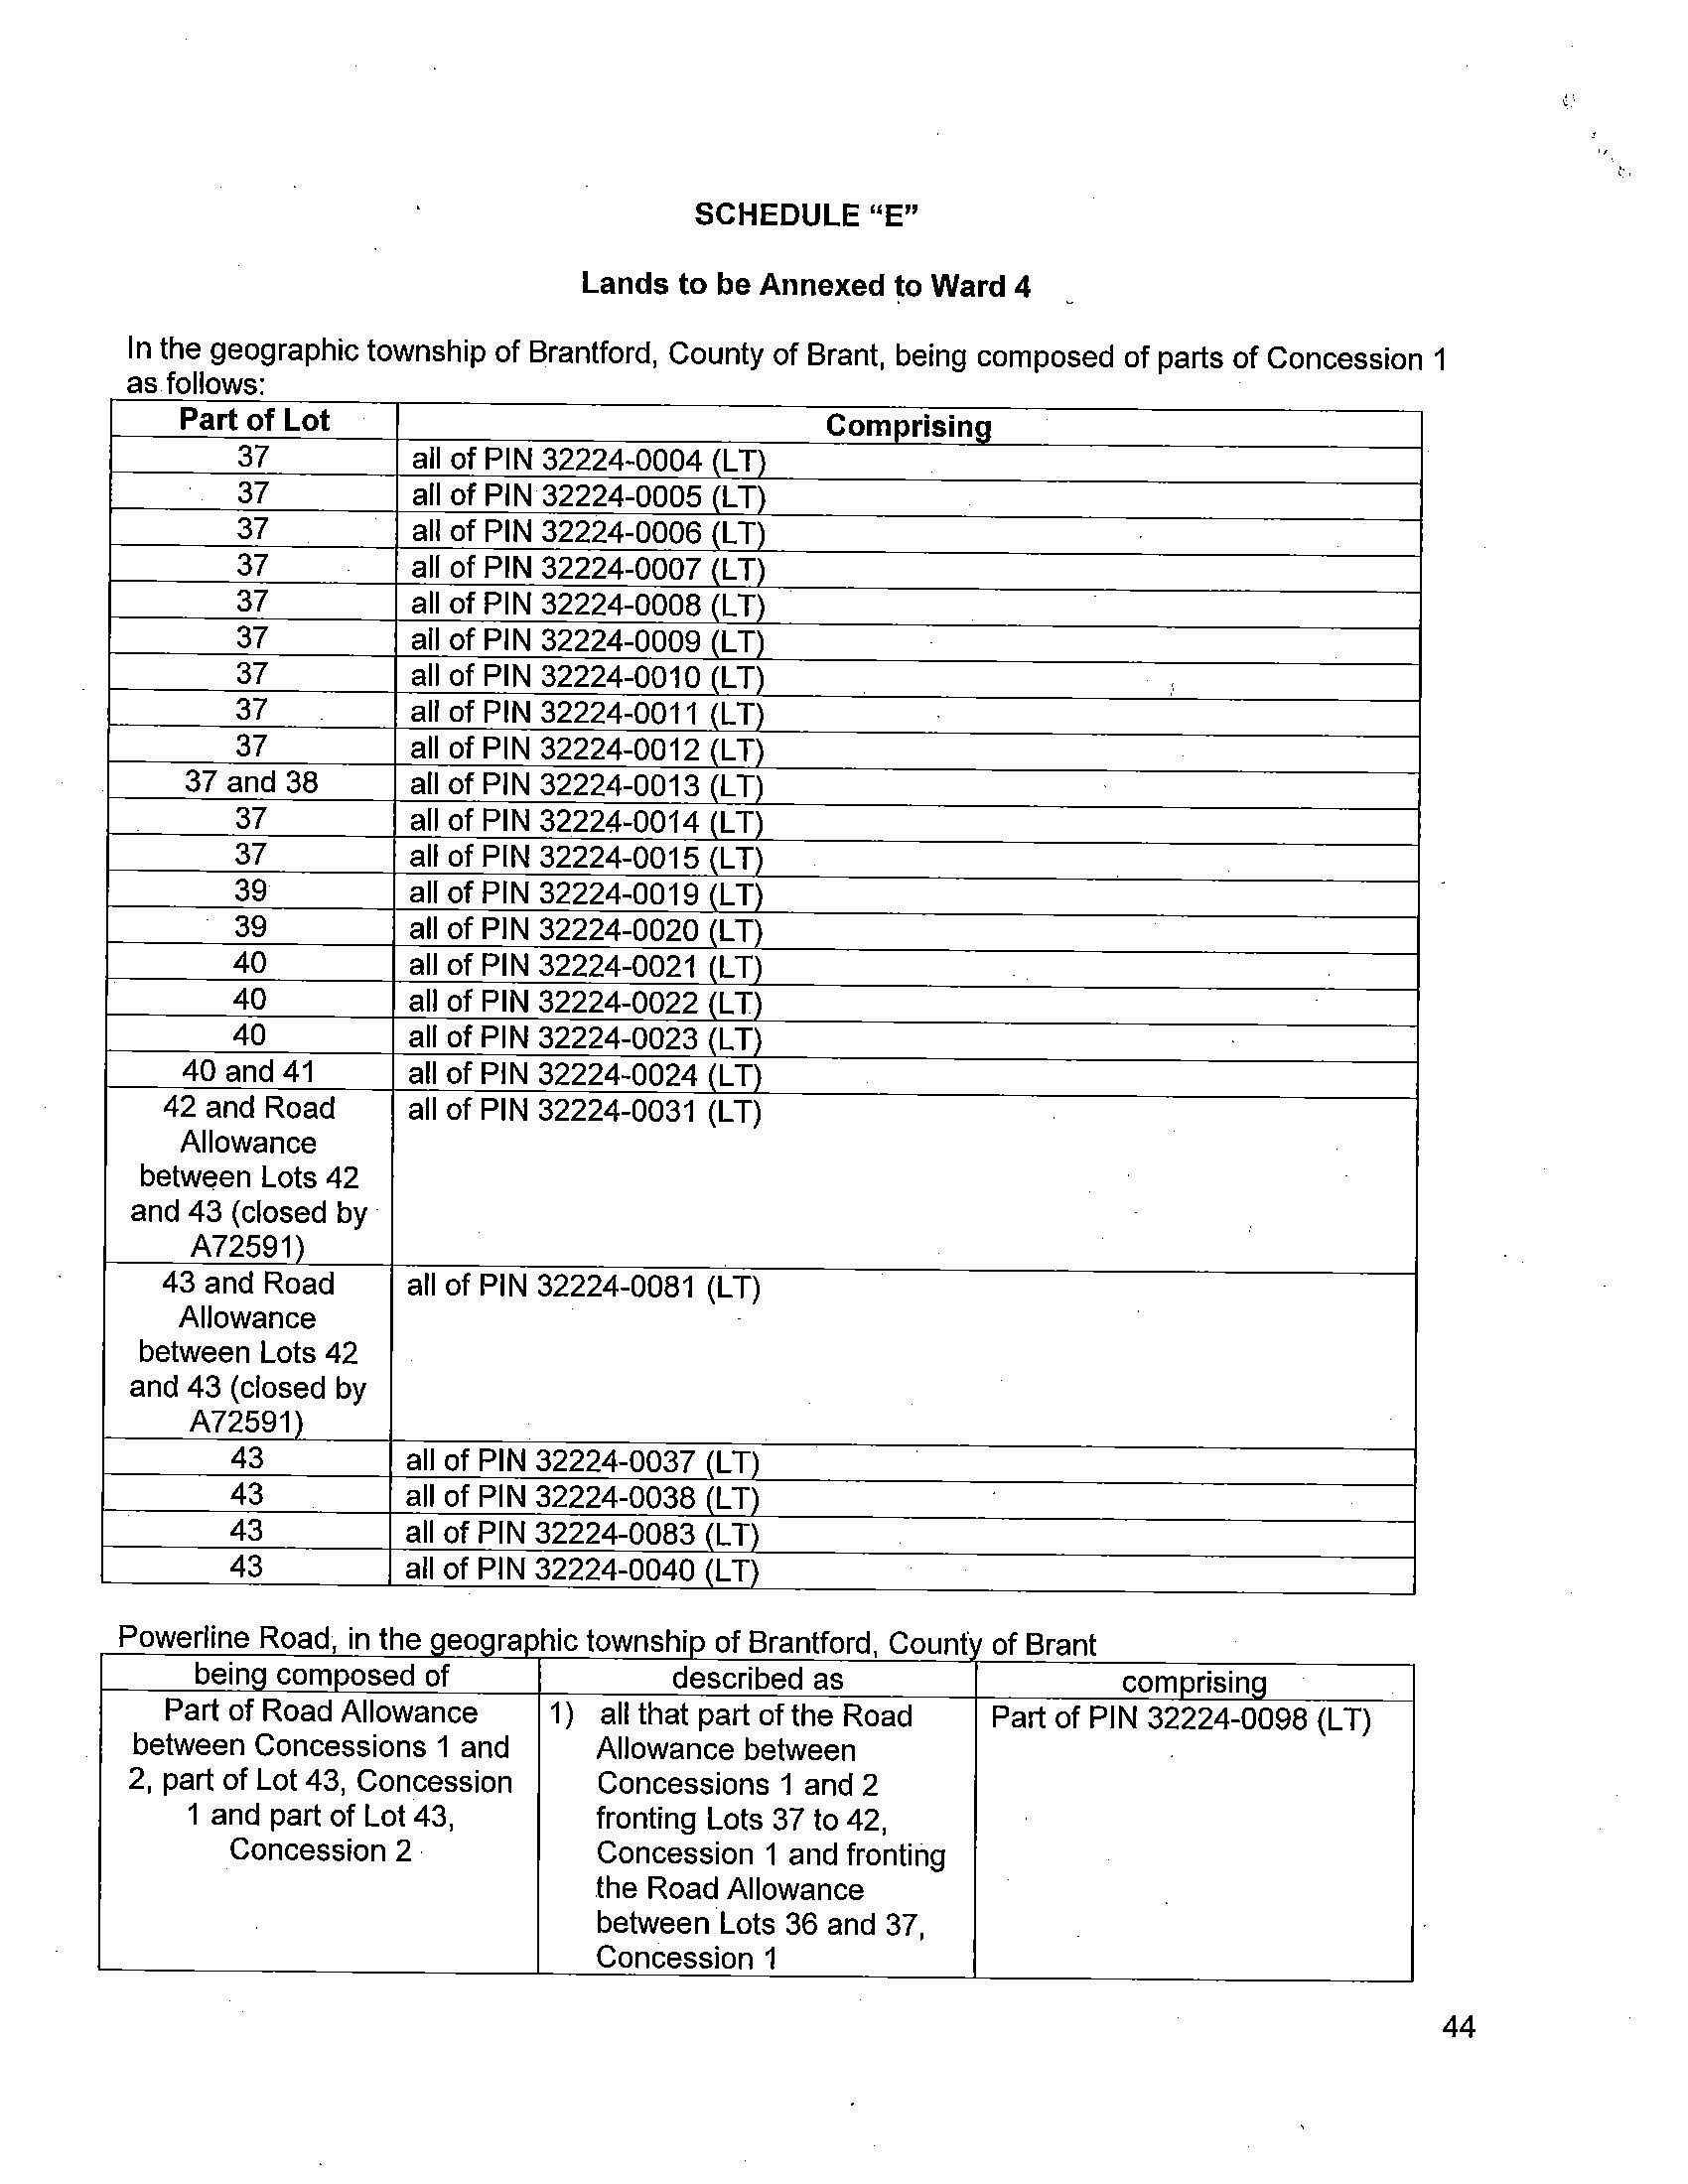 Brantford_Boundary_Signed_Order_Page_44.jpg